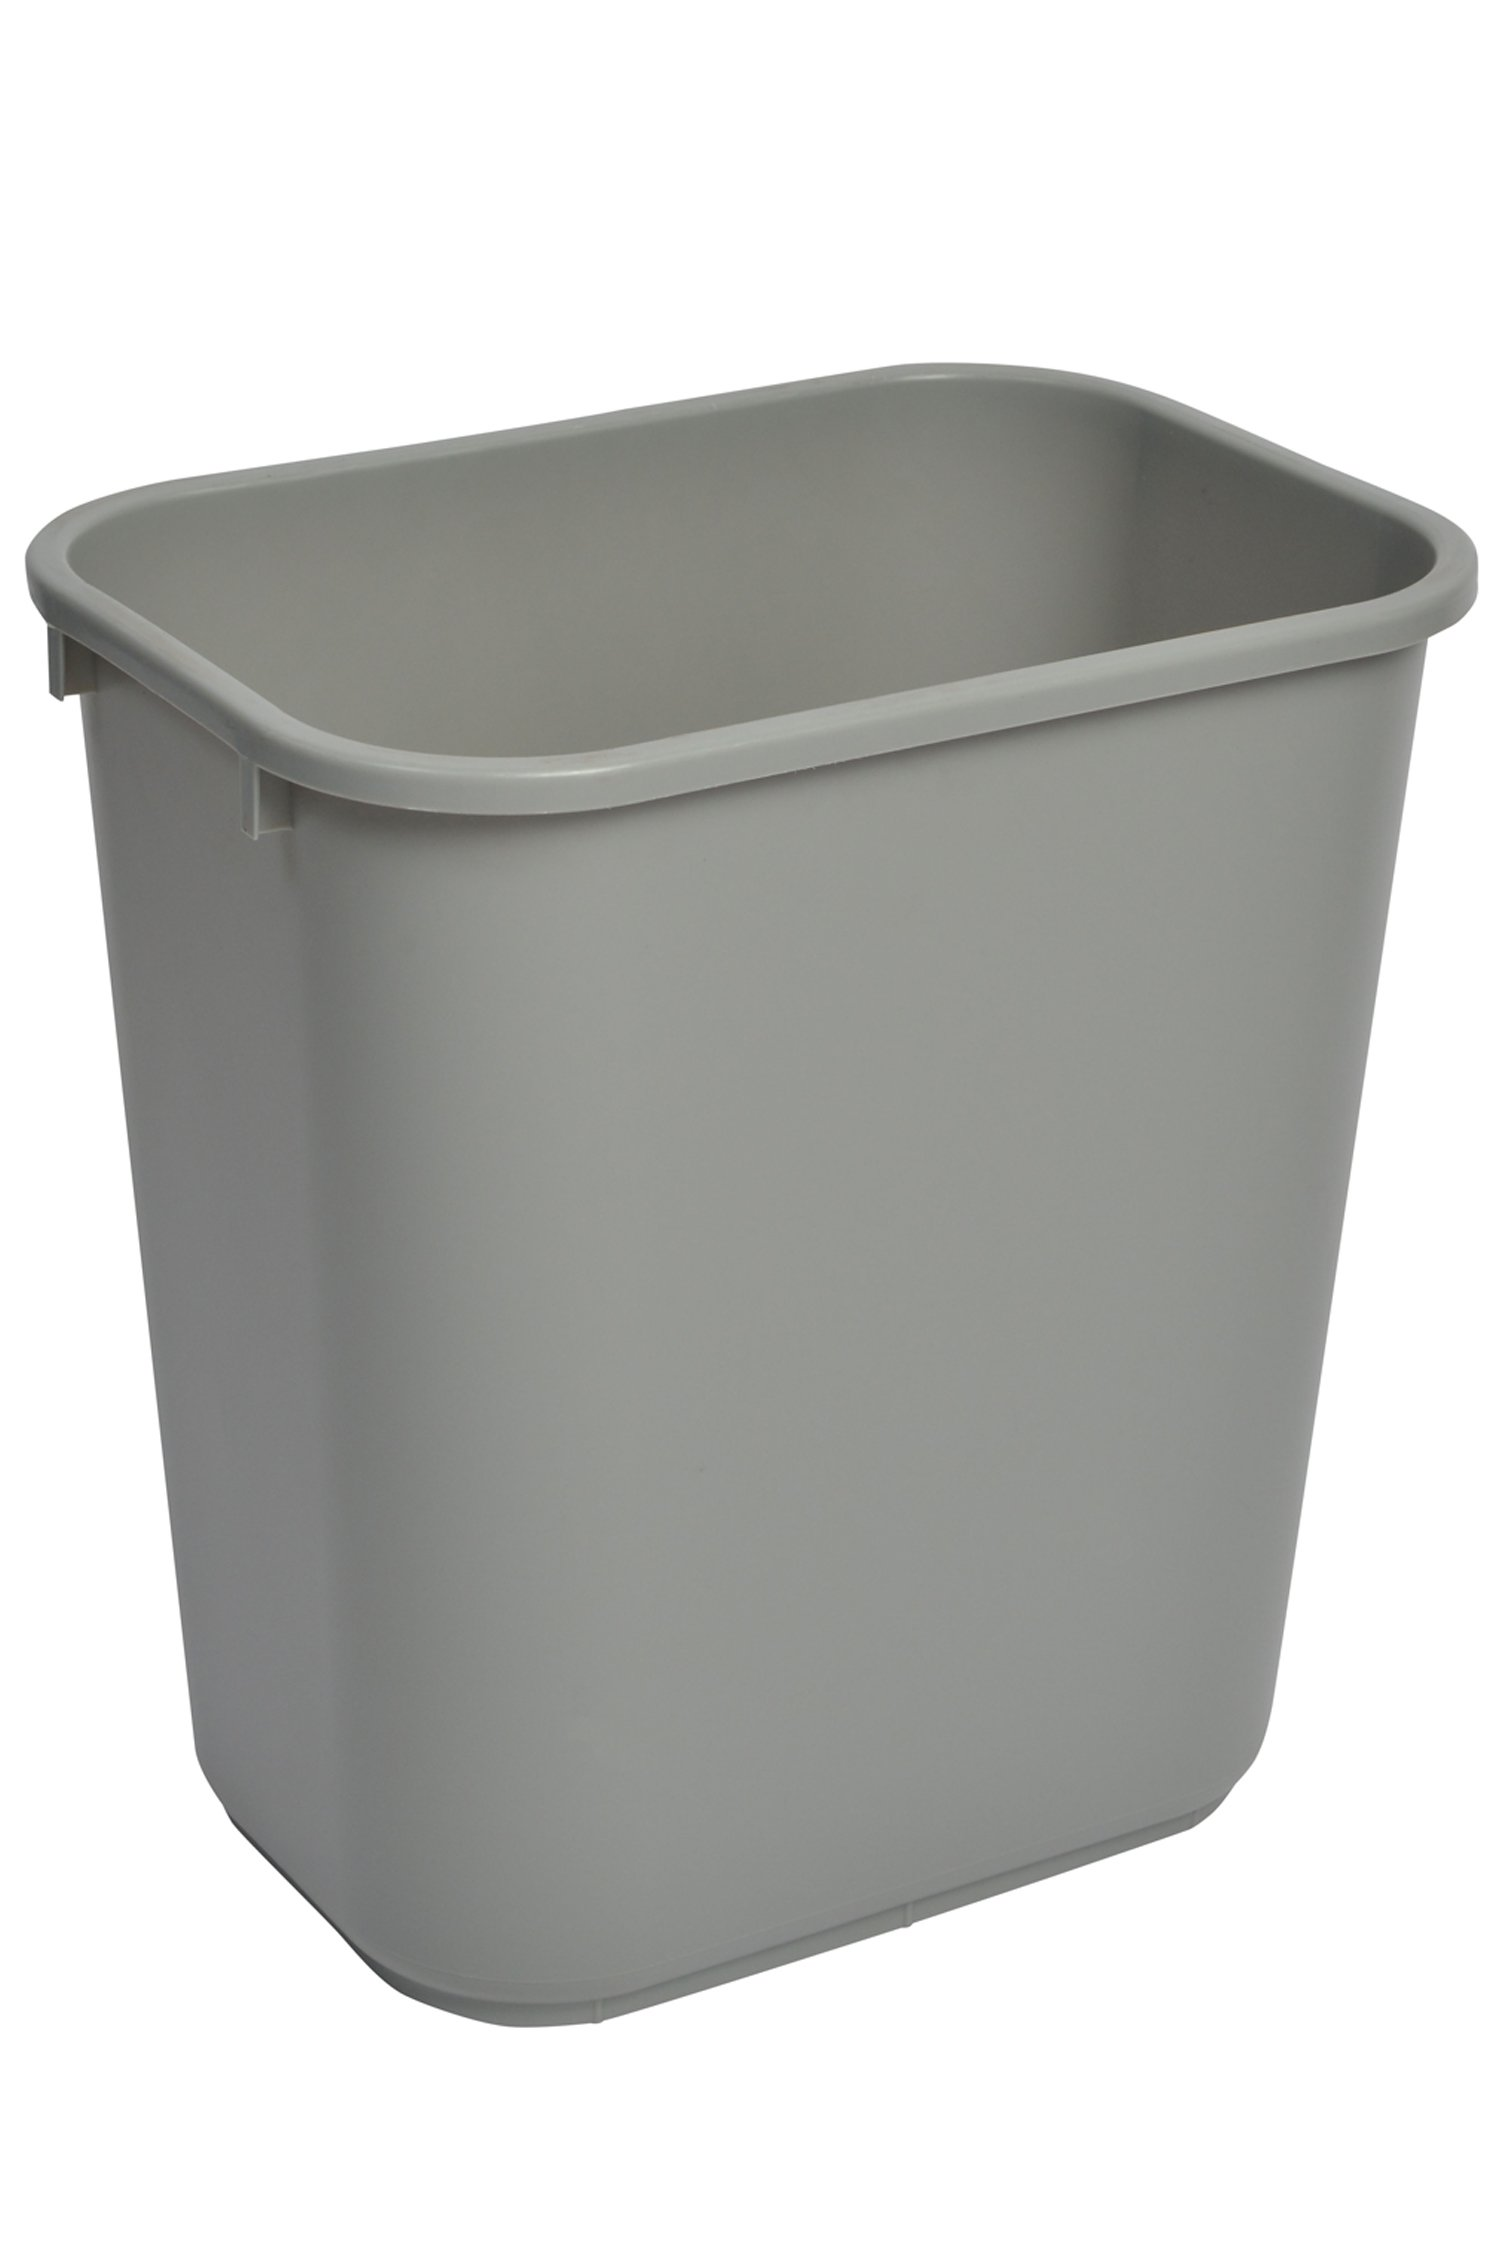 Janico 1037GY 10 Gallon Waste Basket